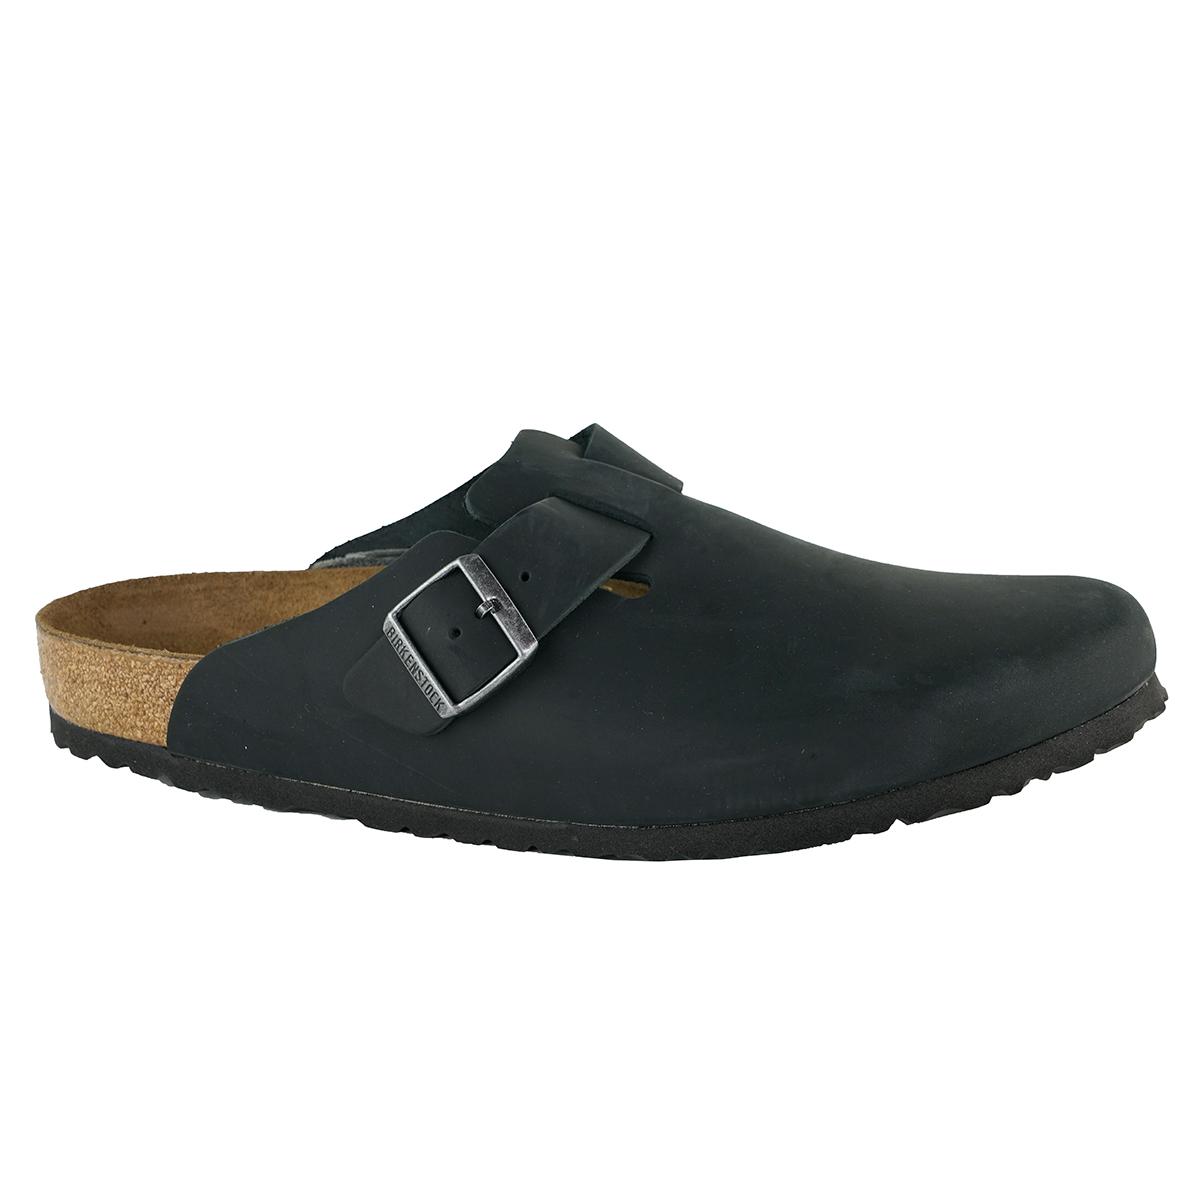 42abeabb16da Birkenstock Boston Oiled leather Clogs Black 35 809410997326